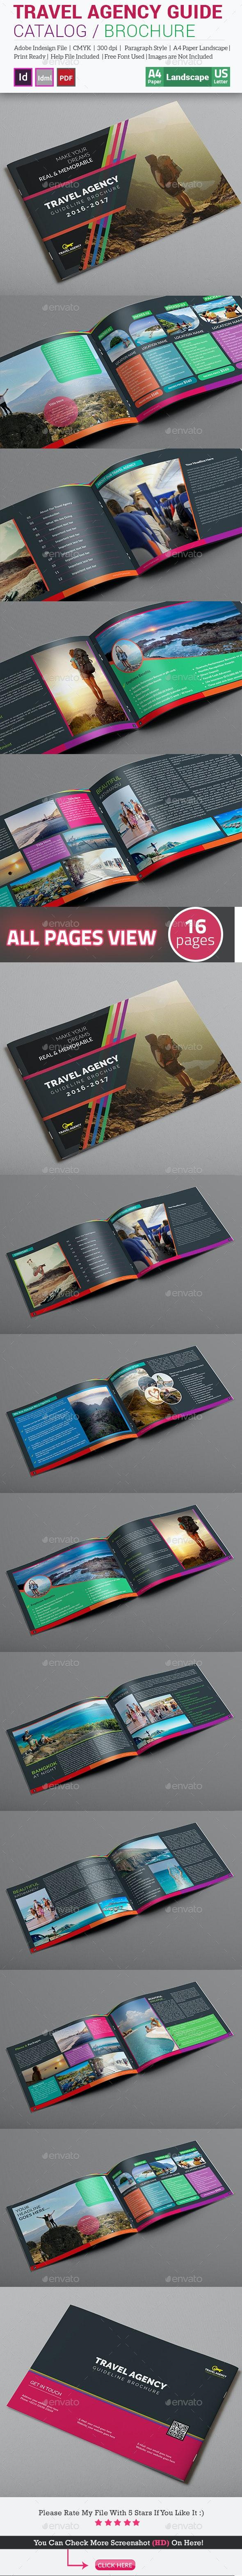 Travel Agency Guide Catalog / Brochure - Catalogs Brochures